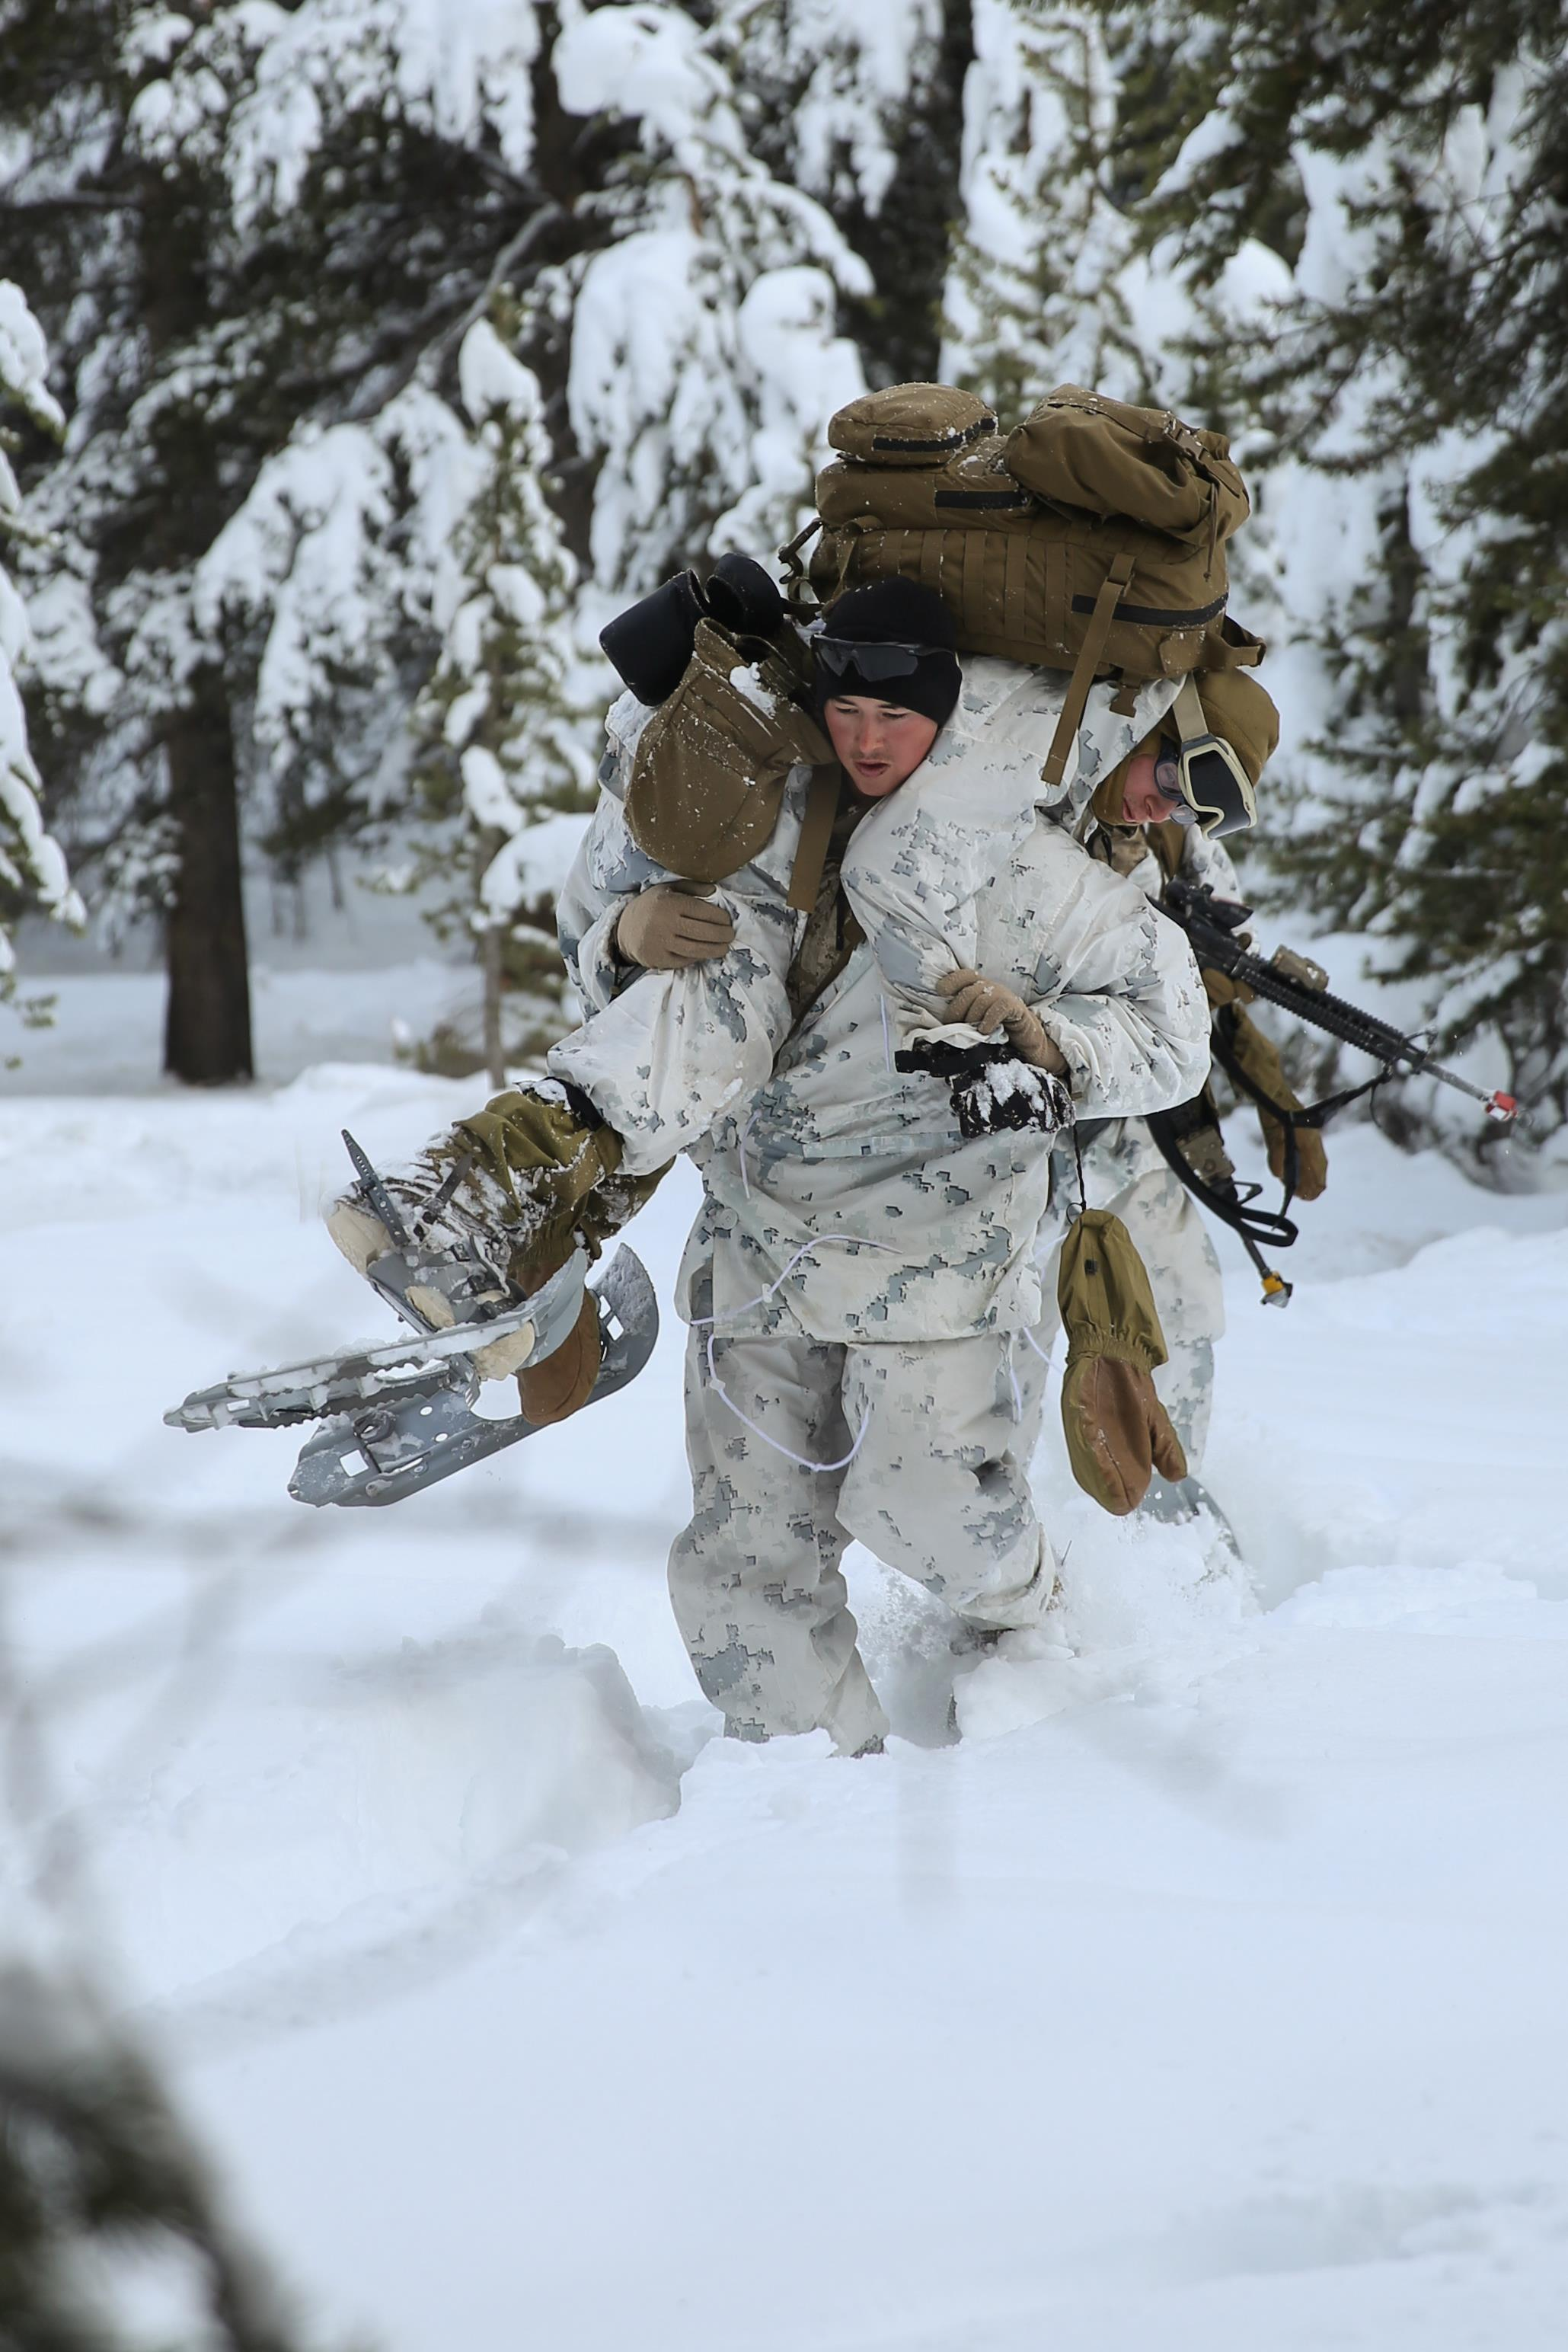 warlords  u2018fight u2019 in winter environment  u0026gt  2nd marine